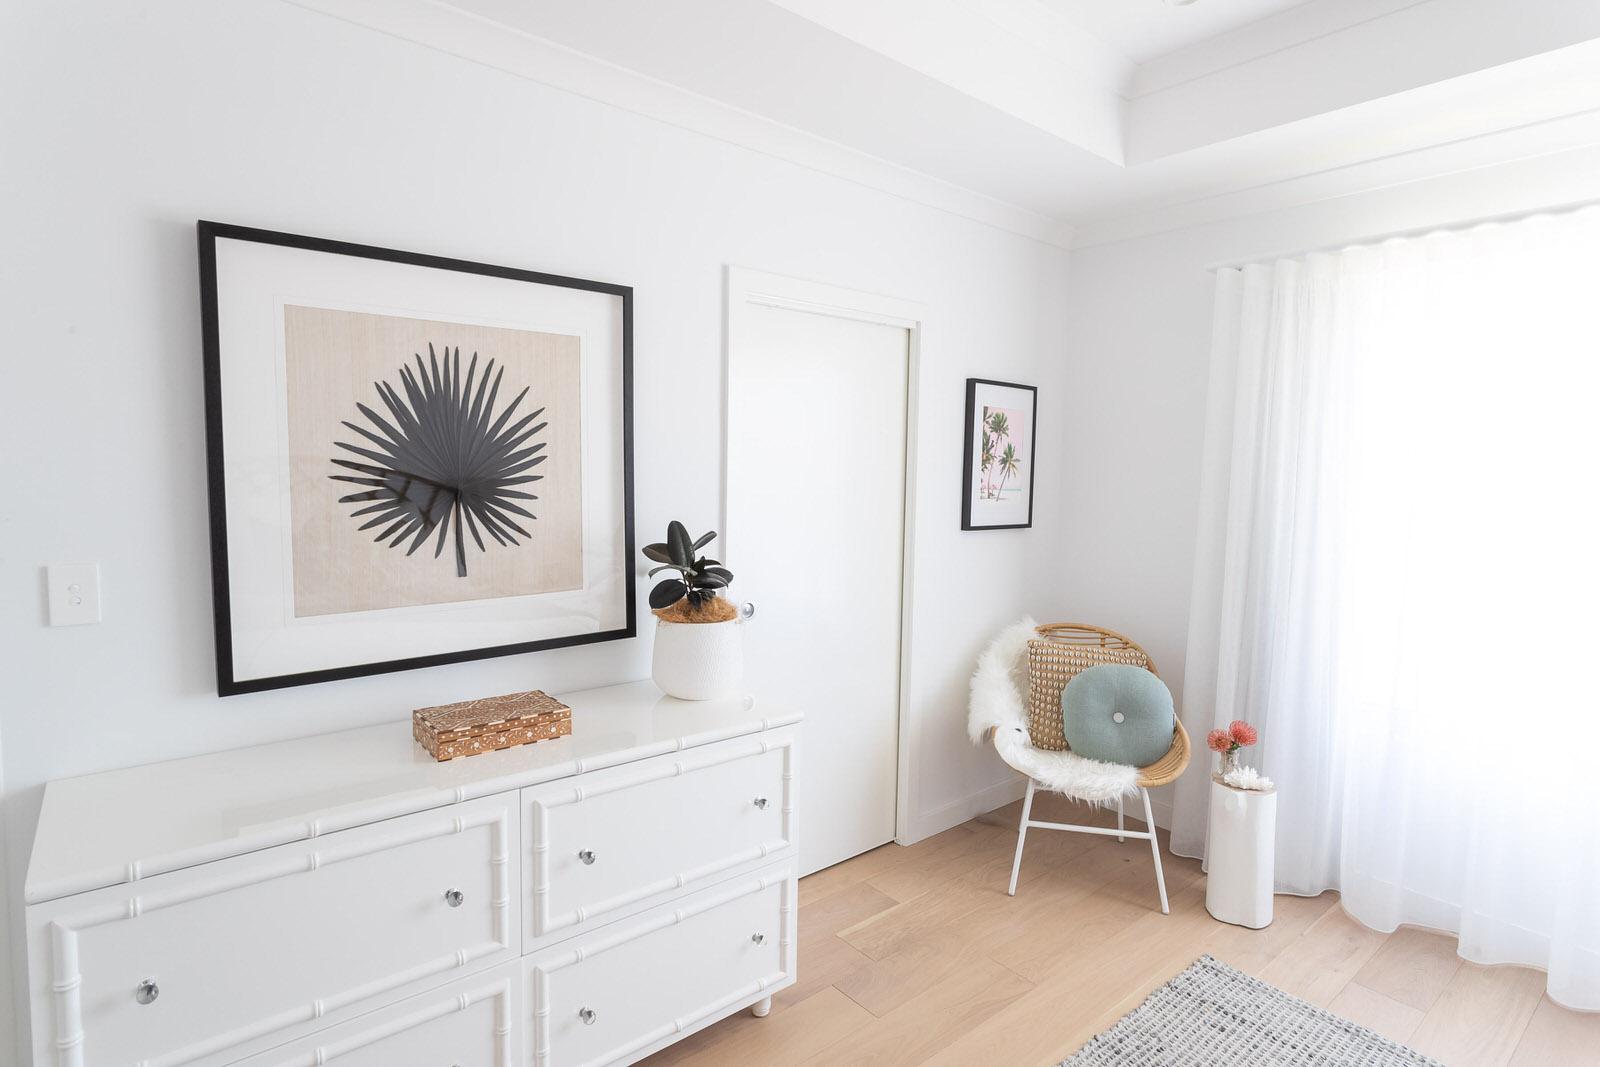 Ammon_Creative-Interior_Photography-Real_Estate-Hatch_Interiors-0164.jpg